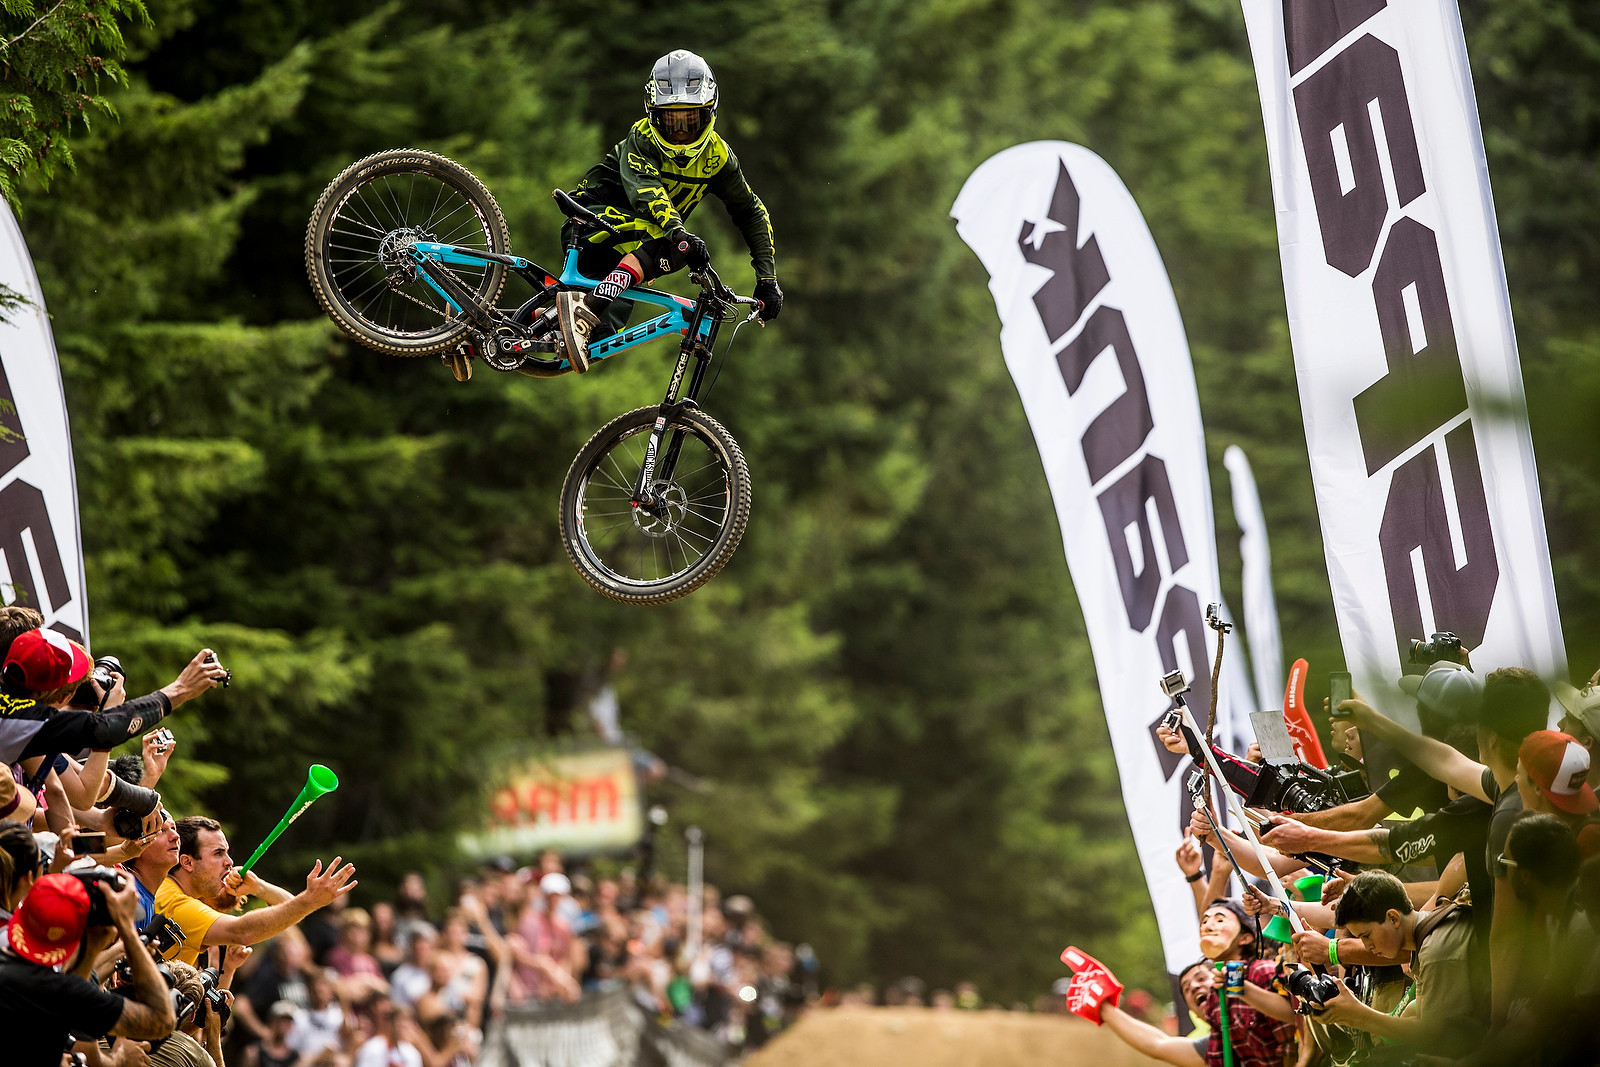 61 of the Sickest Whip Off World Champs Photos - 61 Whip Off World Champs Photos - Mountain Biking Pictures - Vital MTB